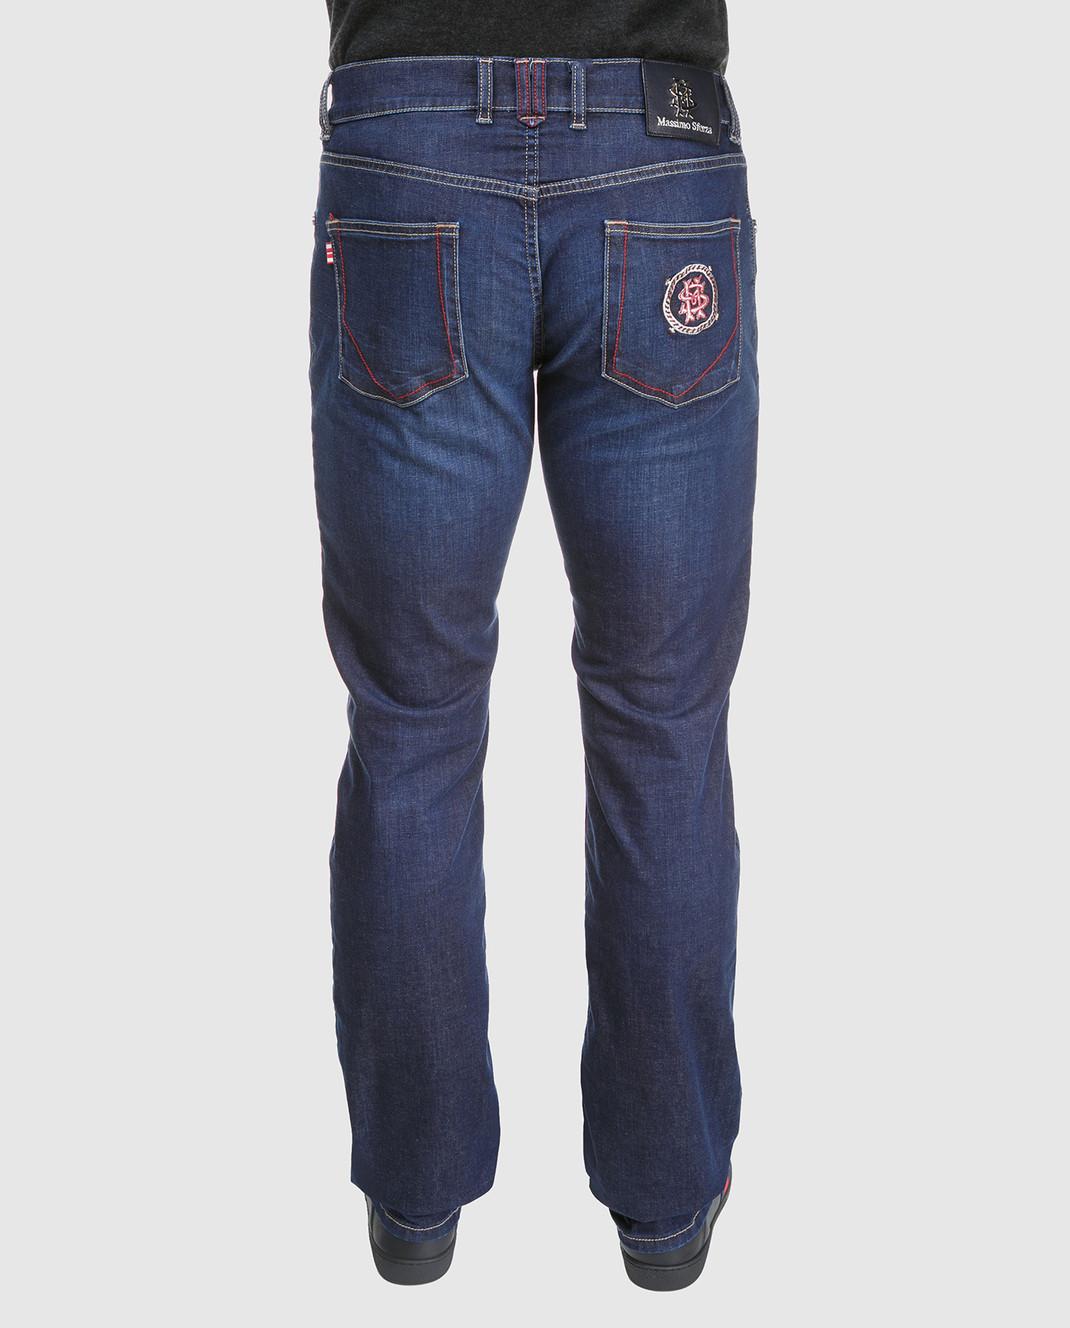 Massimo Sforza Синие джинсы RIVIERAWEBER13 изображение 4